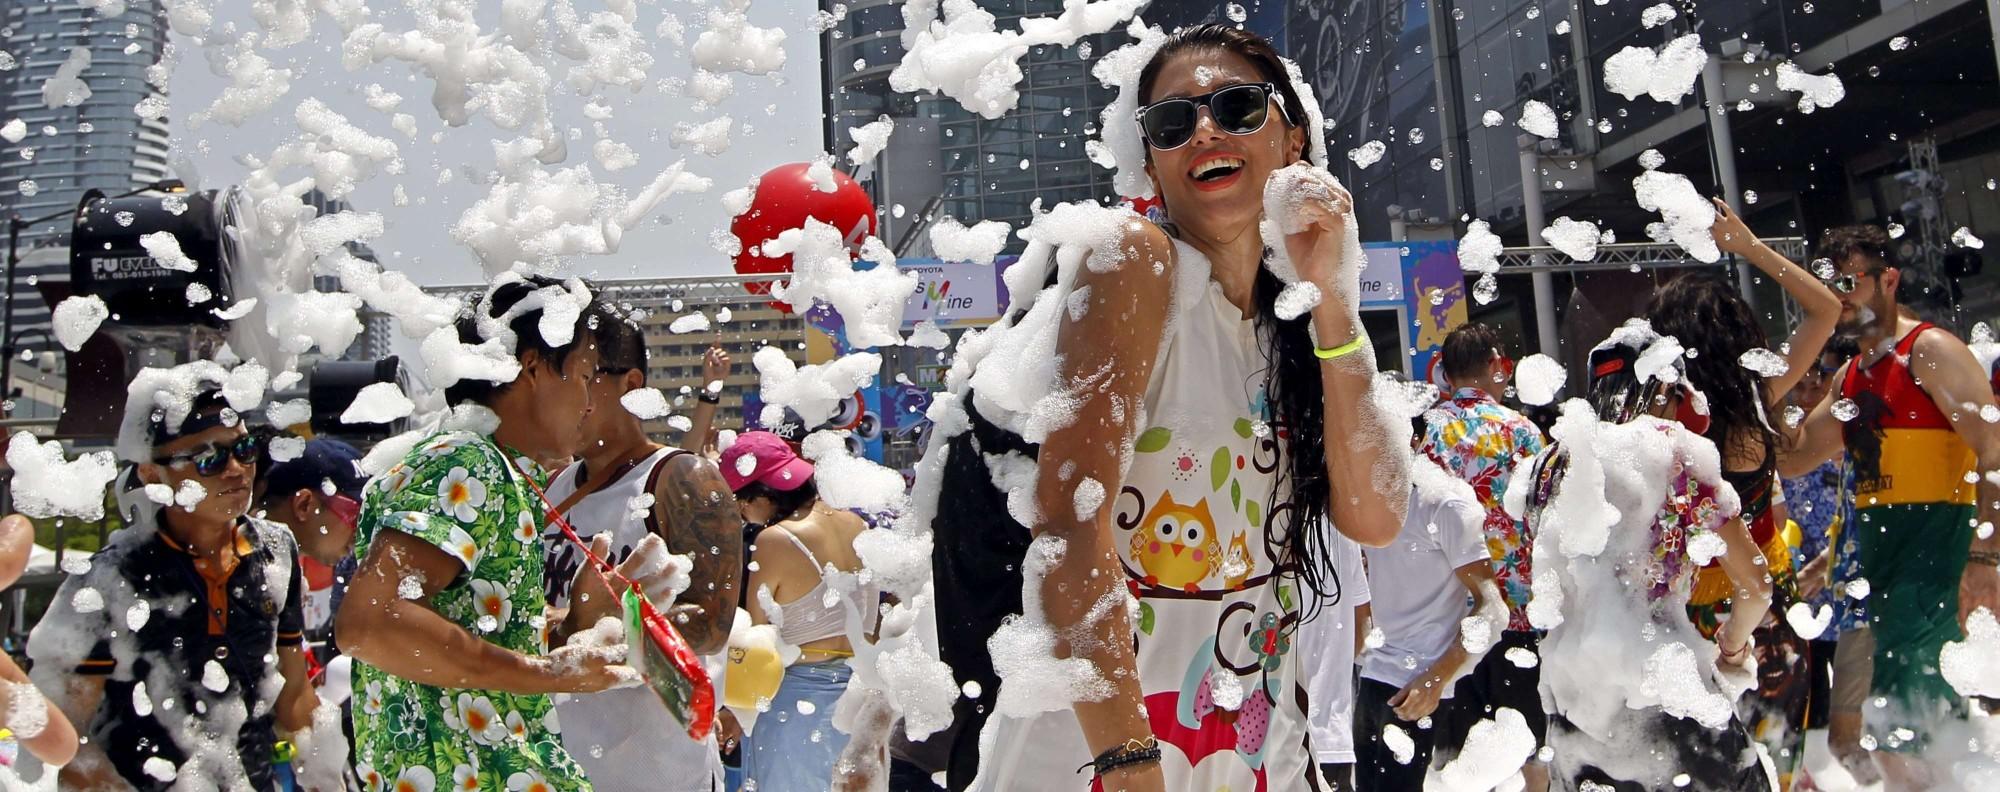 Bangkok's Songkran celebration in 2016. Photo: EPA